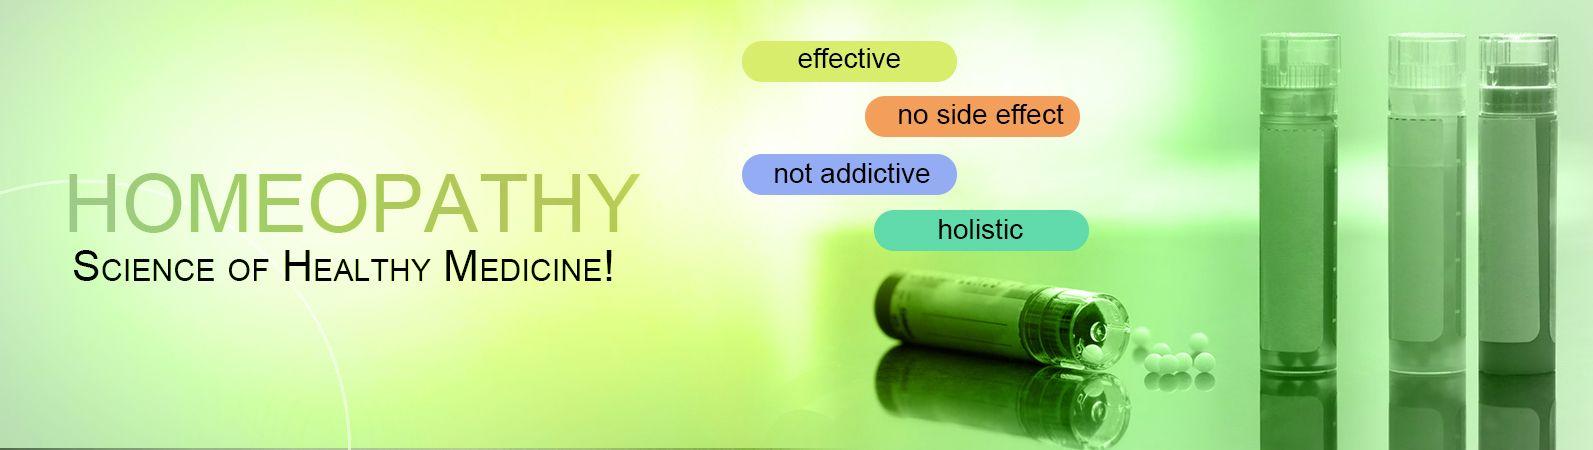 Web Banner Design For Vira S Homeopathy Web Banner Design Banner Design Web Banner